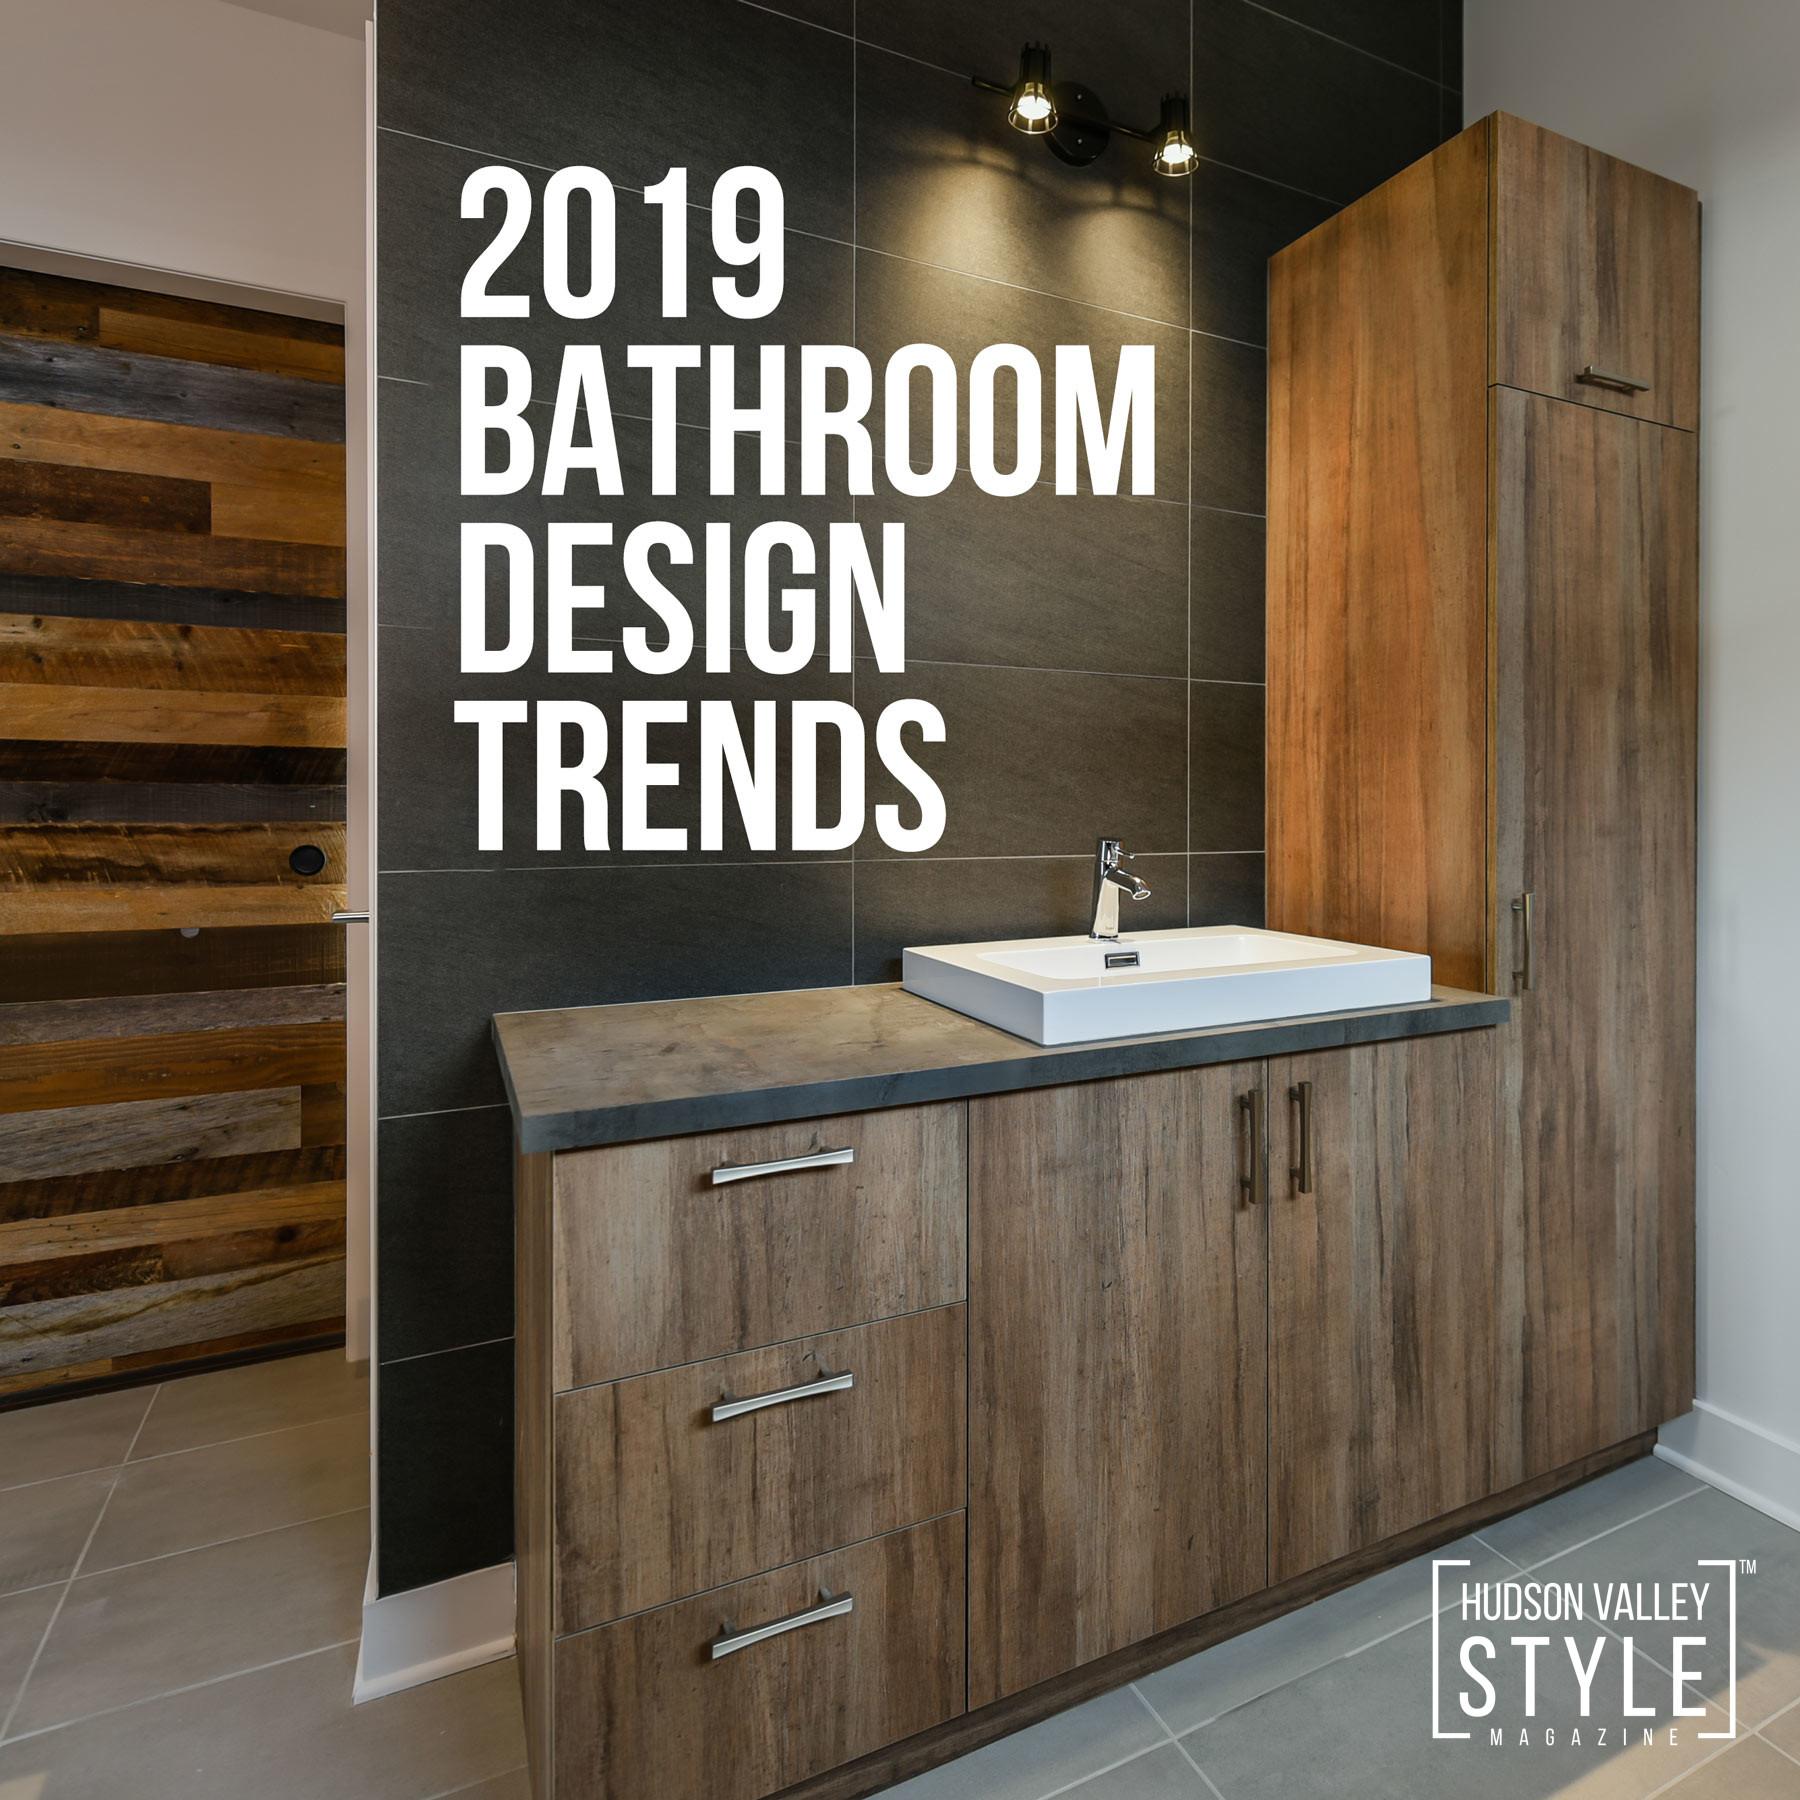 2019 Bathroom Design Trends Bathroom Design Ideas